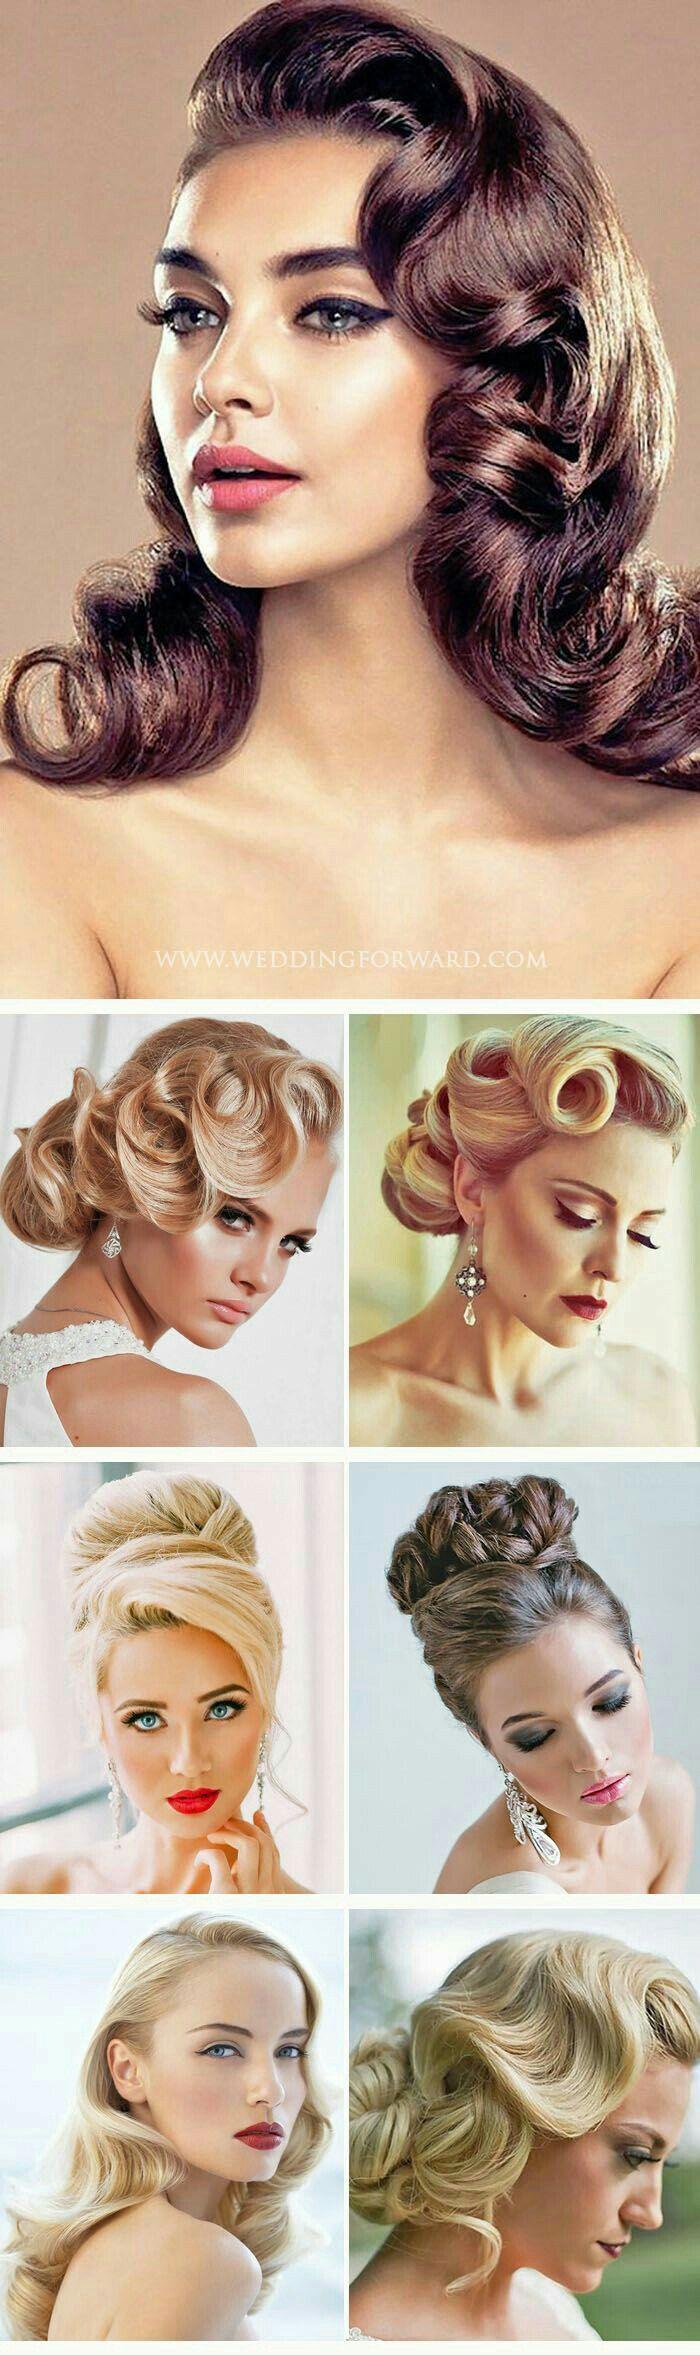 Pin by antonia ferguson on hair pinterest hair style vintage